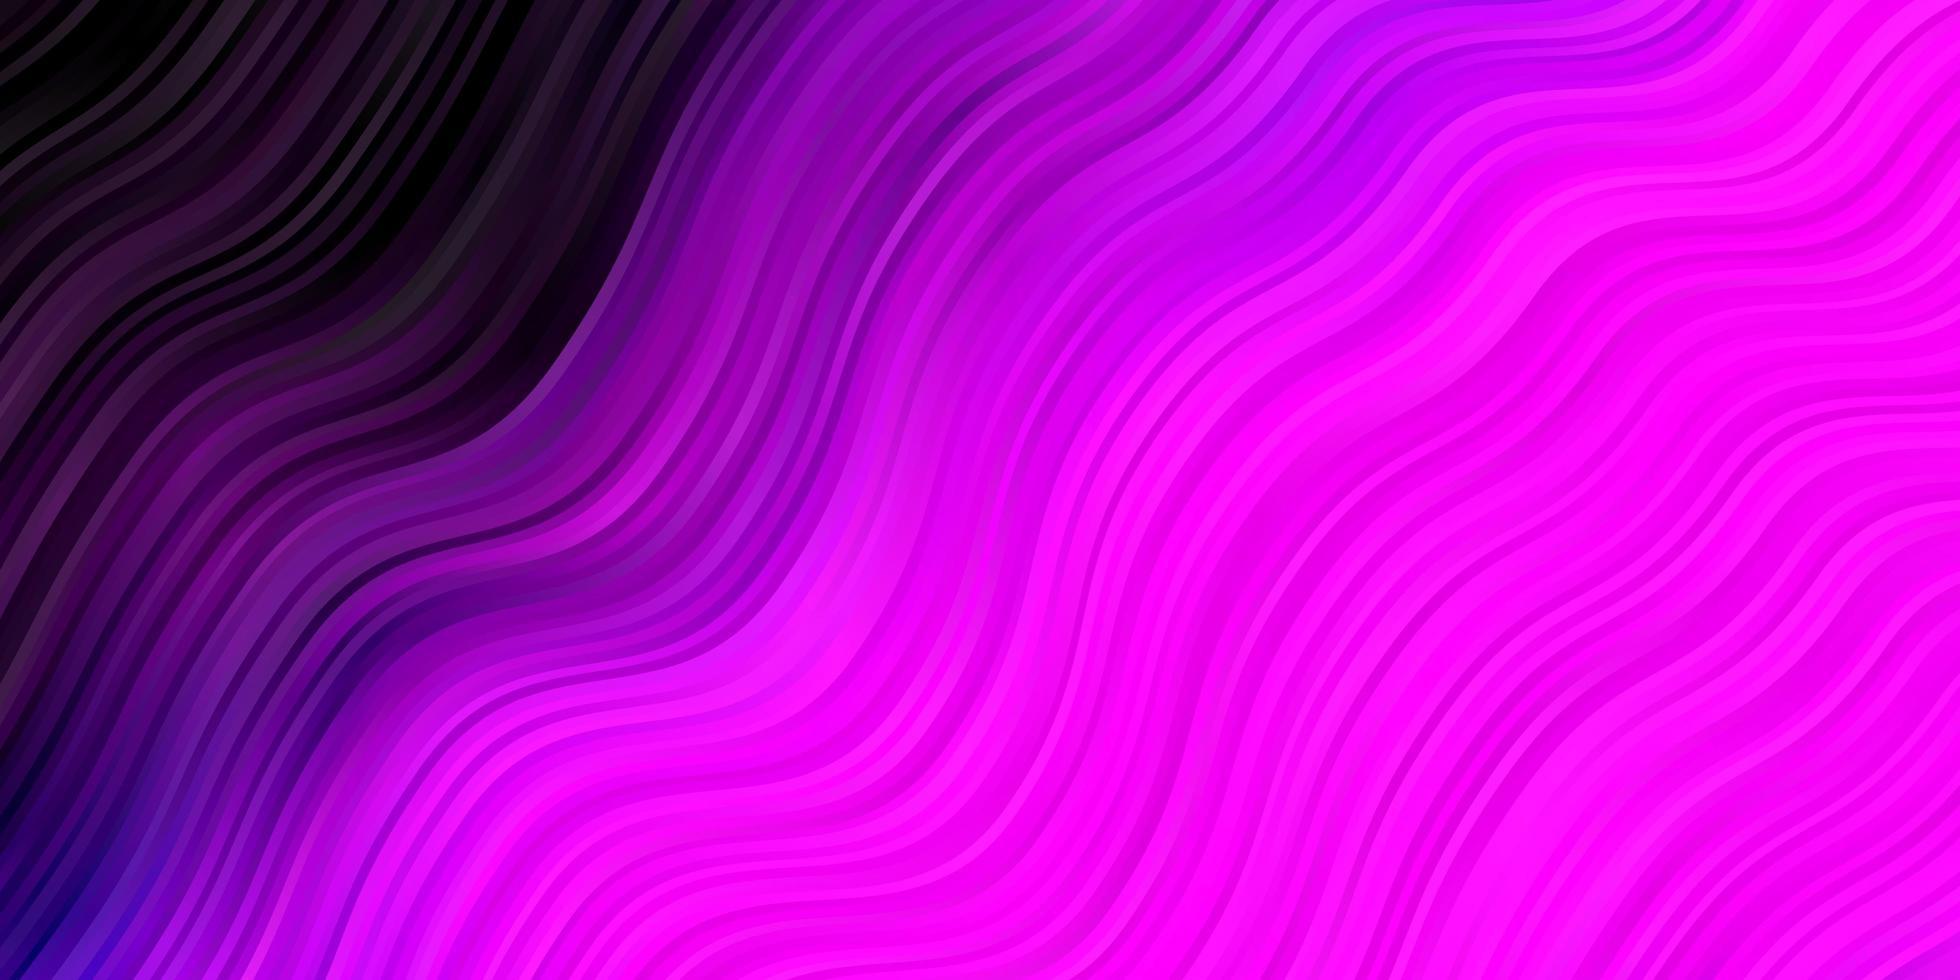 fondo rosa con líneas. vector